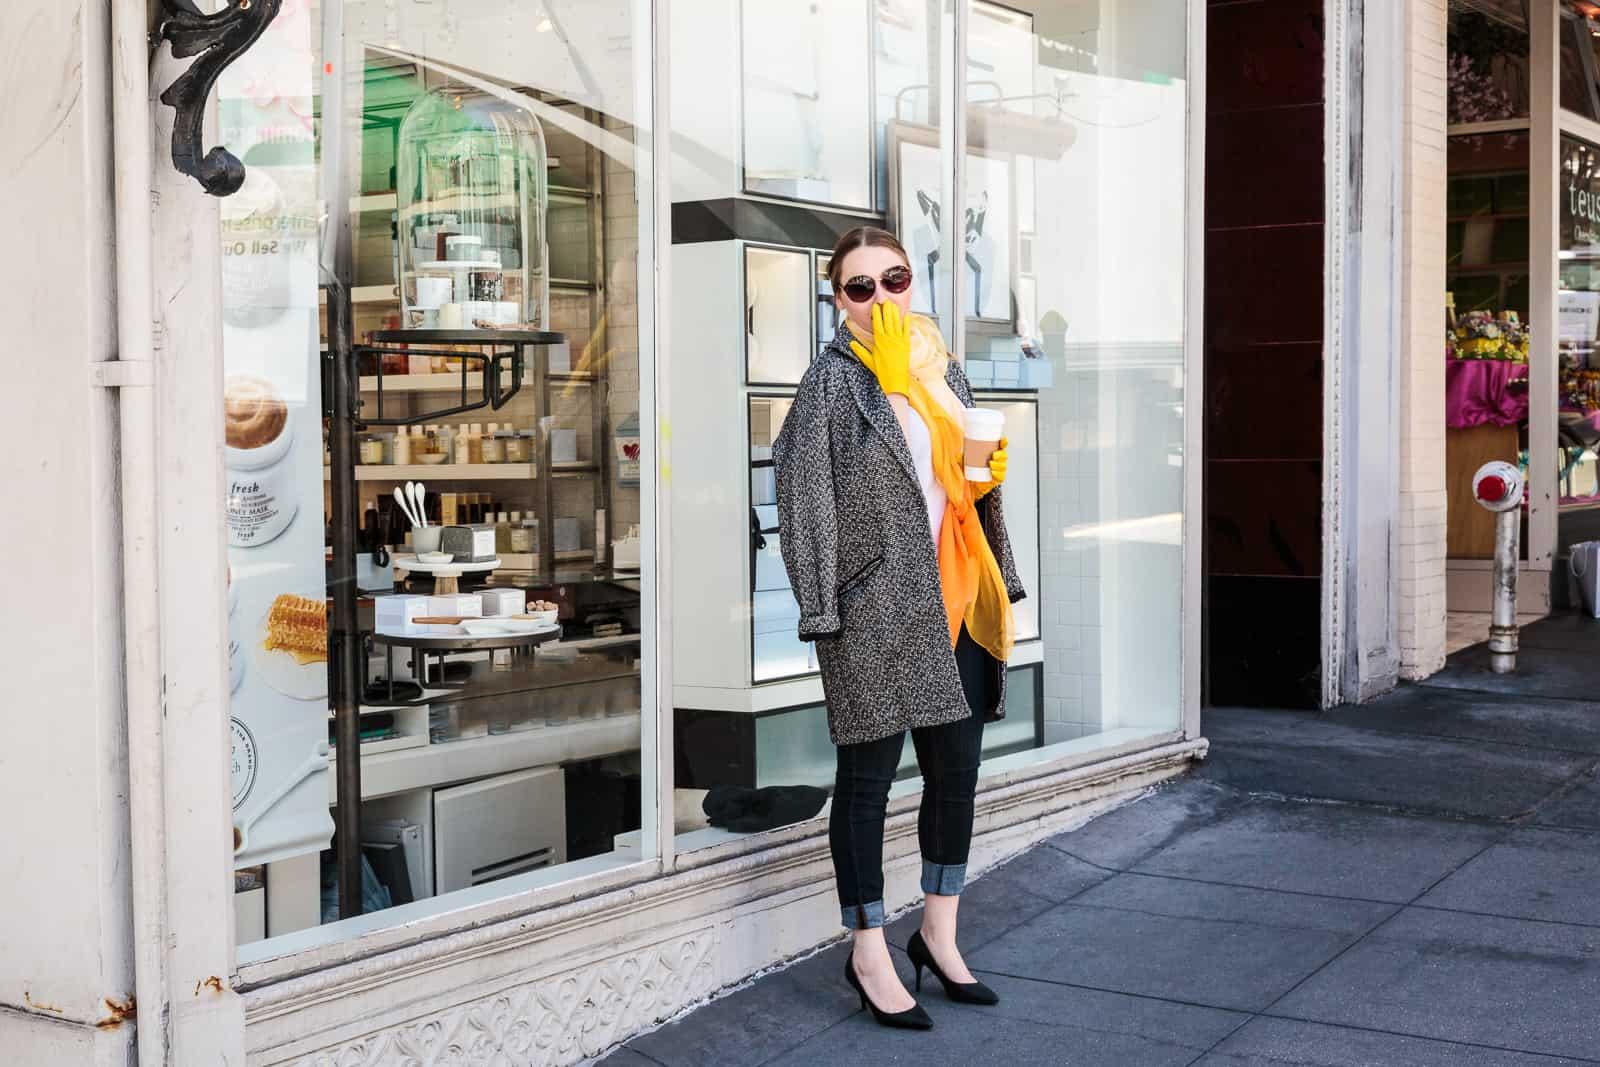 beau-gant-classic-gloves-silk-lining-yellow-fashion